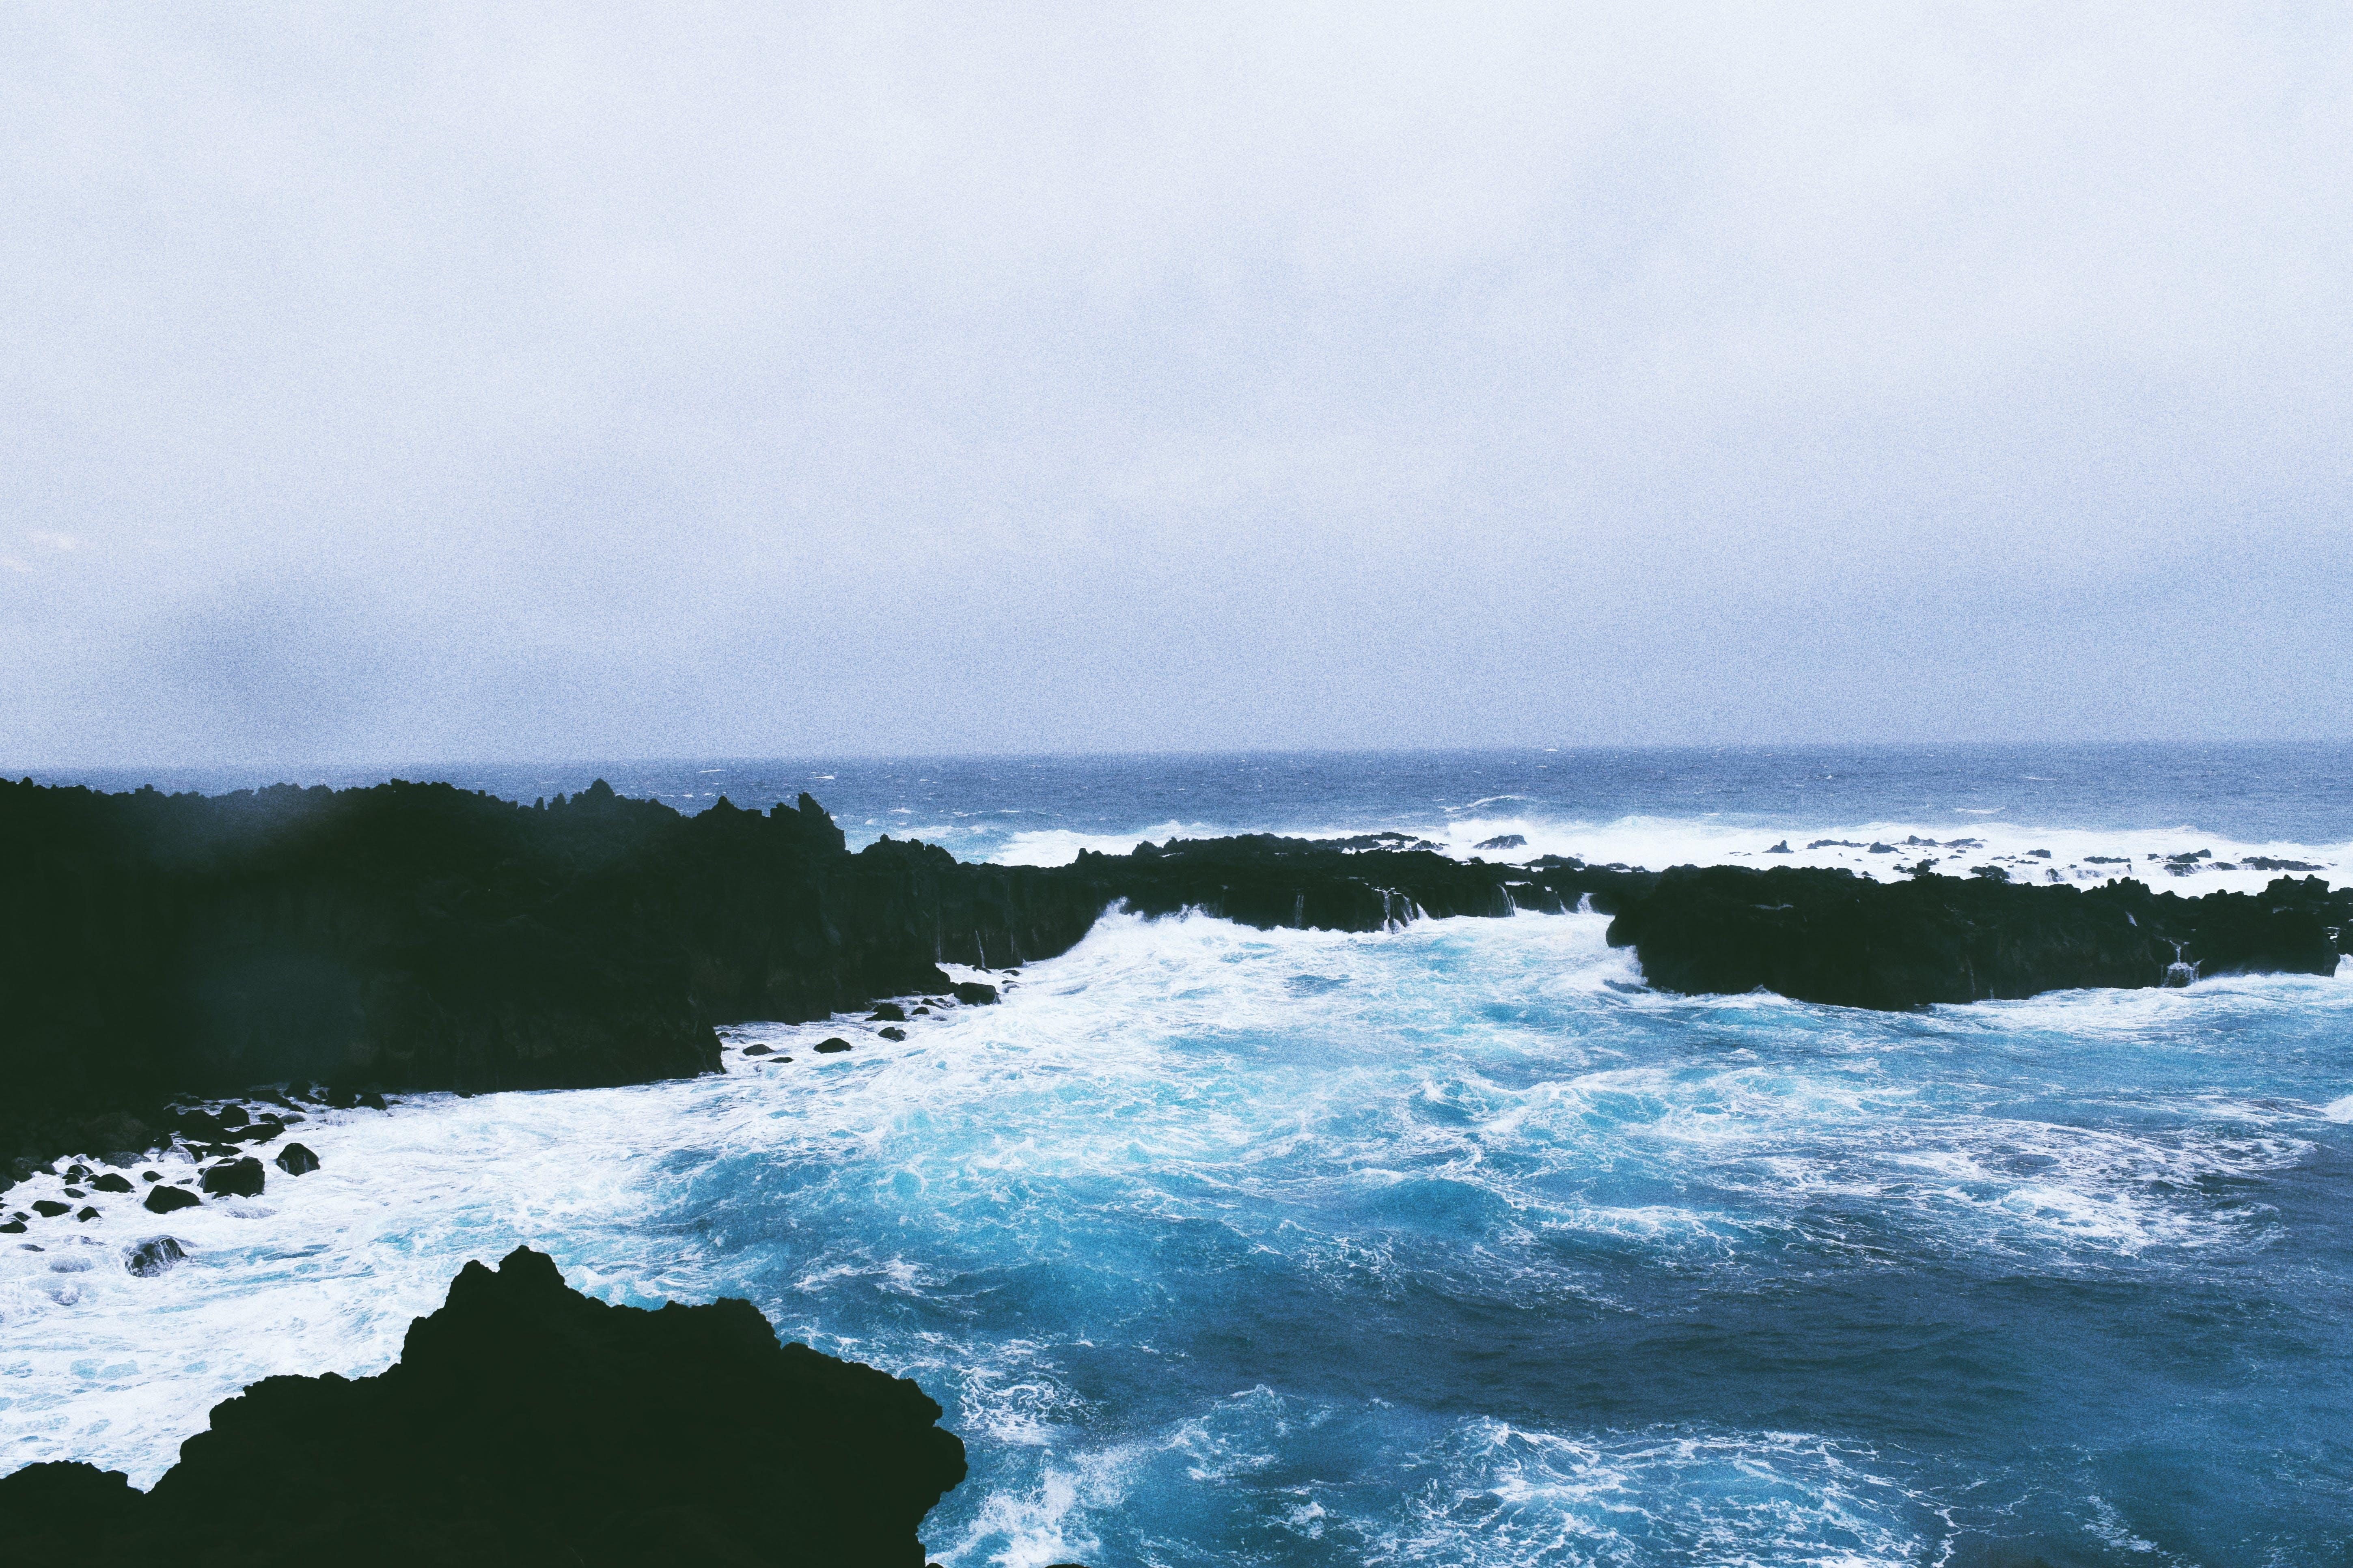 Azores, daylight, fog